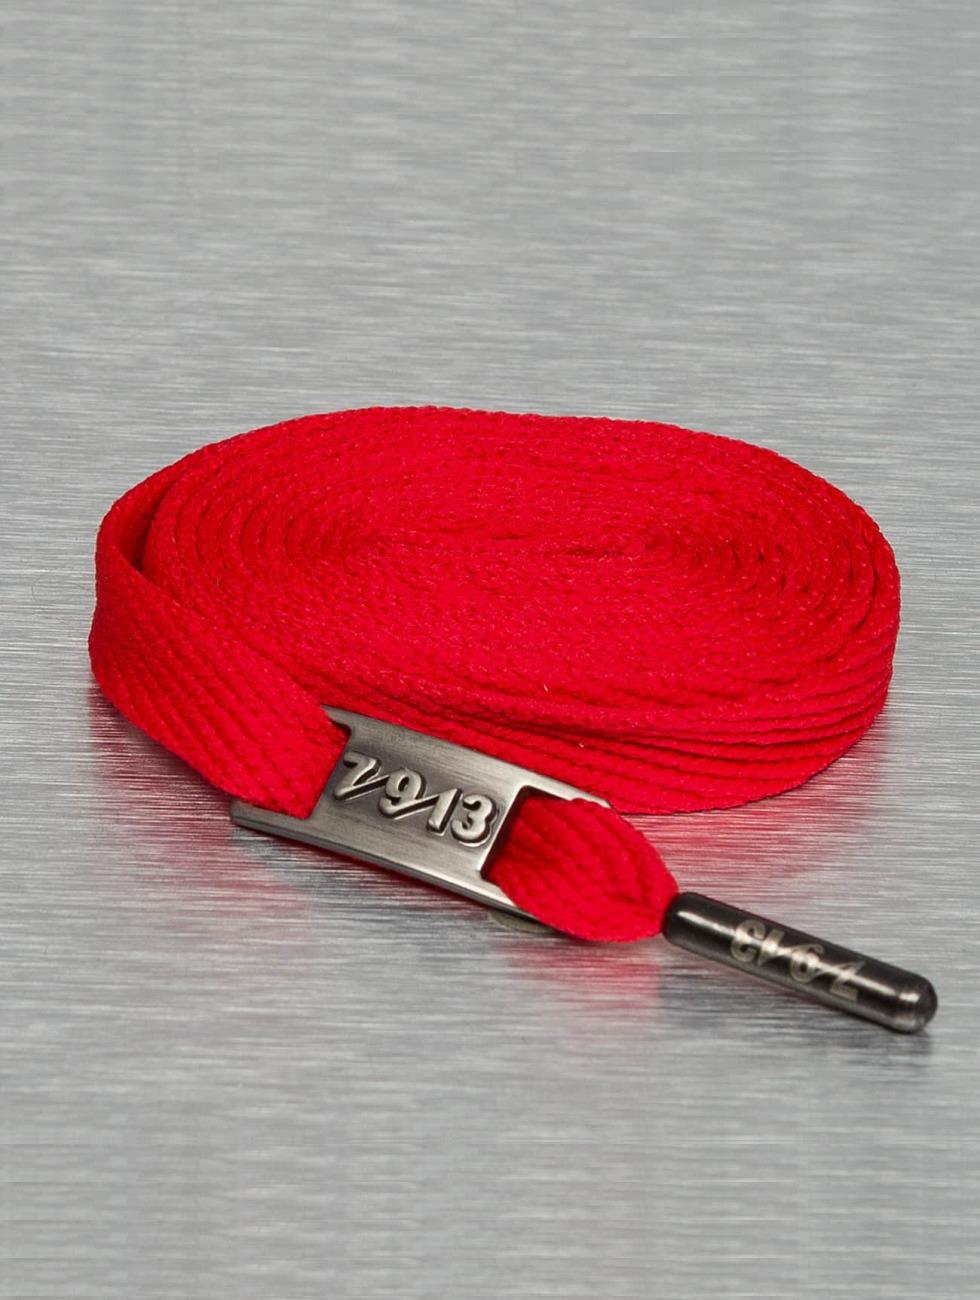 Seven Nine 13 Shoelace Full Metal red